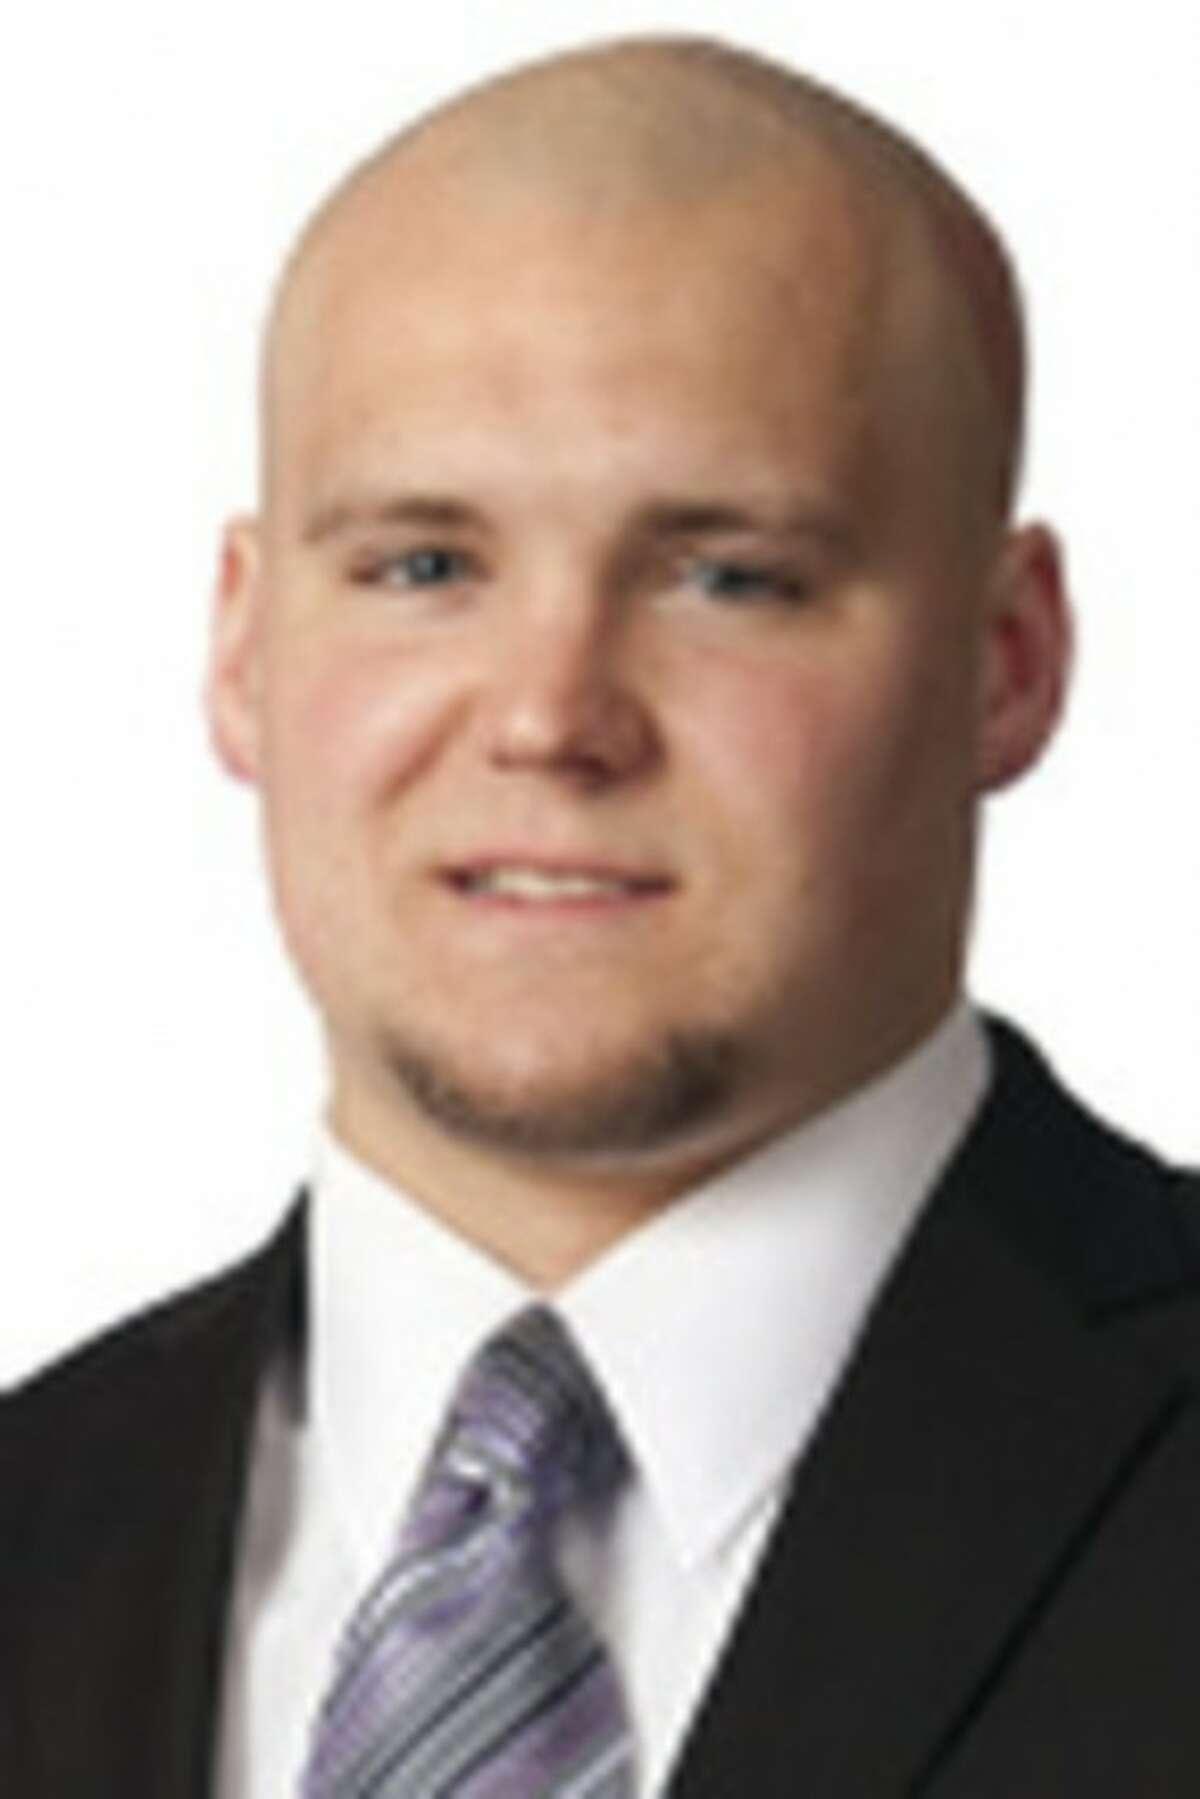 UConn Football Notebook -- Seymour's Osiecki leaves UConn football team